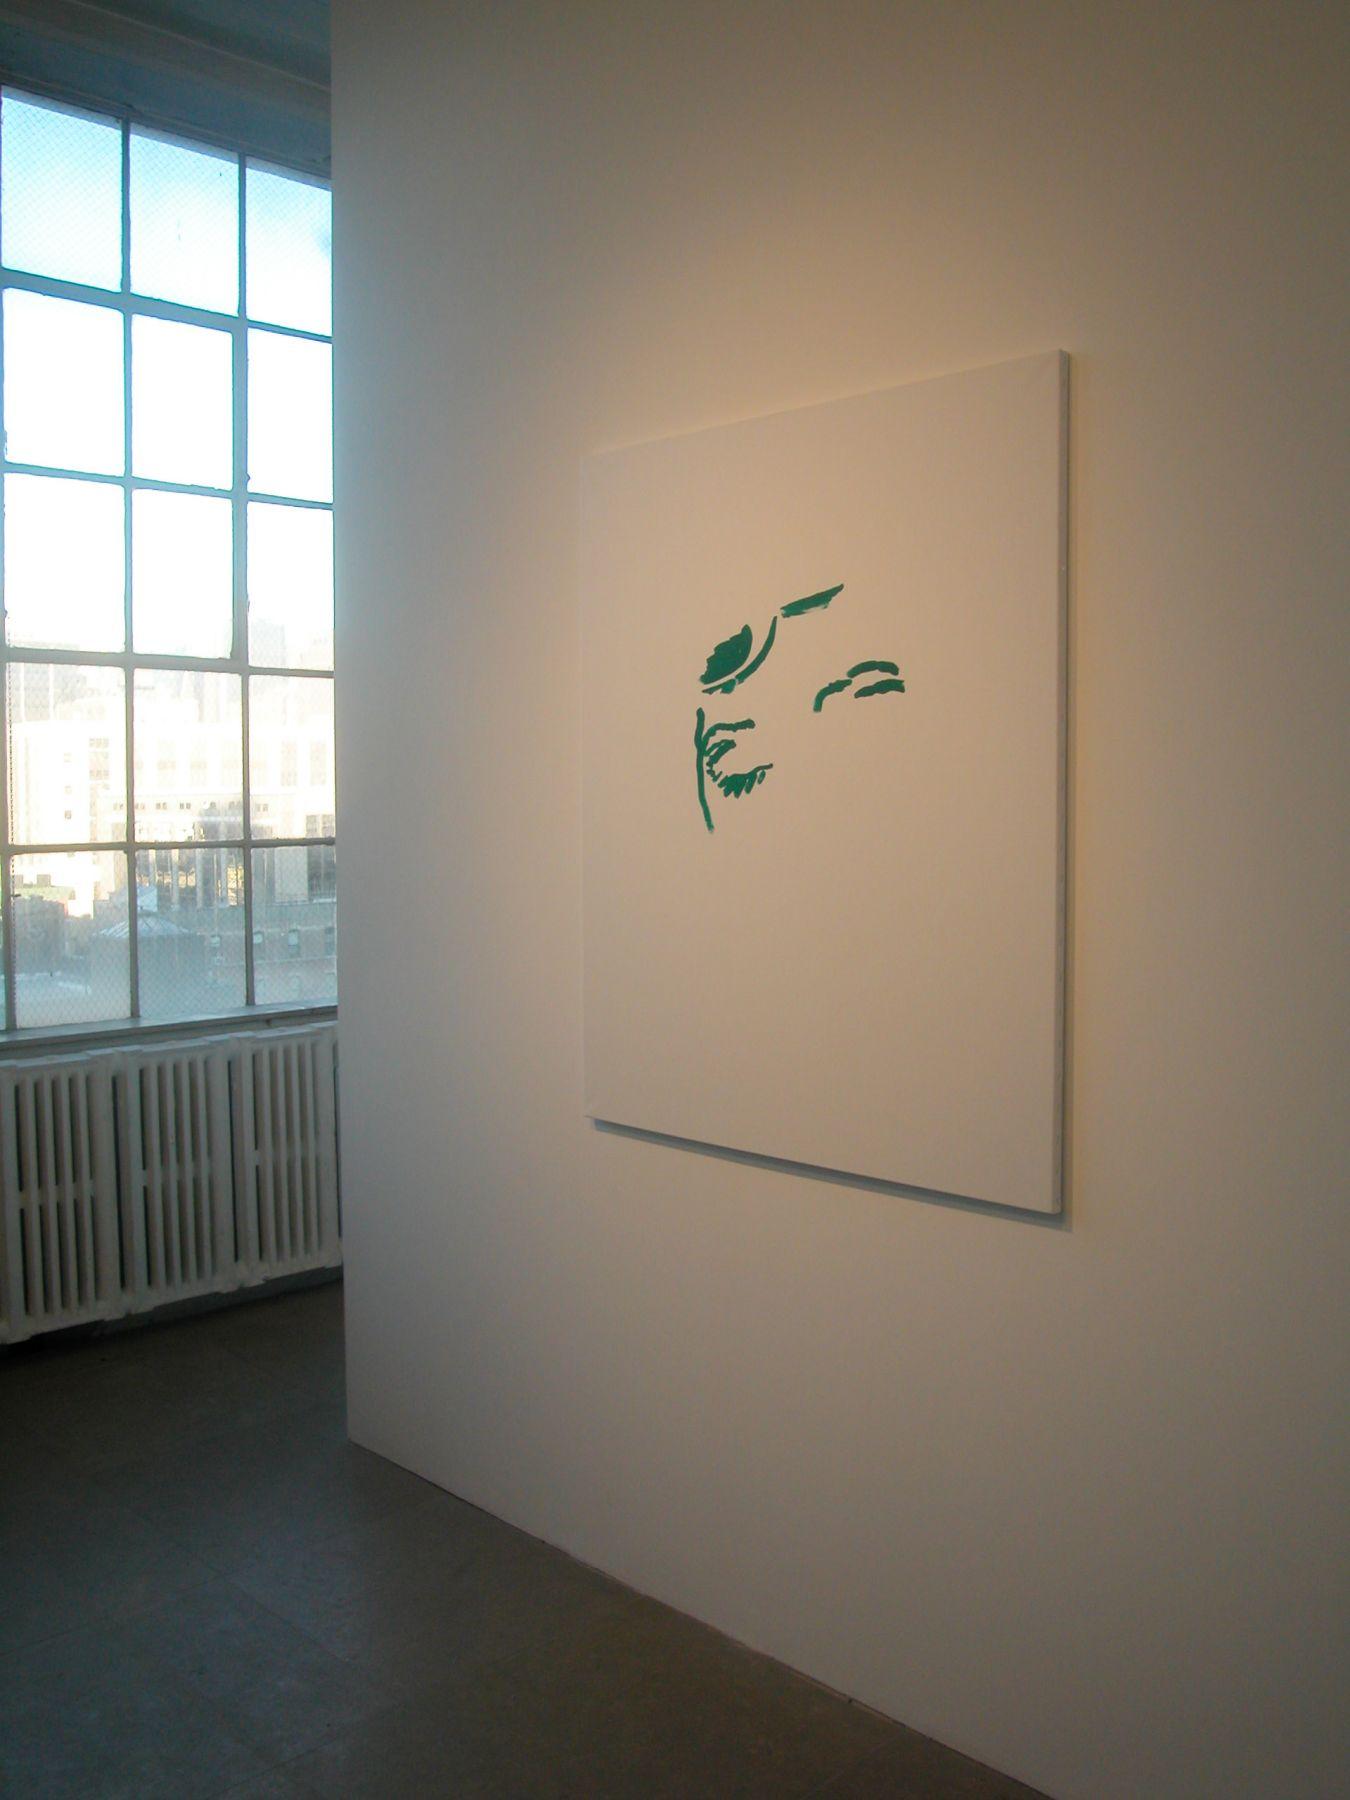 Michael Krebber,  A Ha, 2001,  Oil on canvas,  48 x 39 1/2 inches,  Installation view, Greene Naftali, New York, 2005